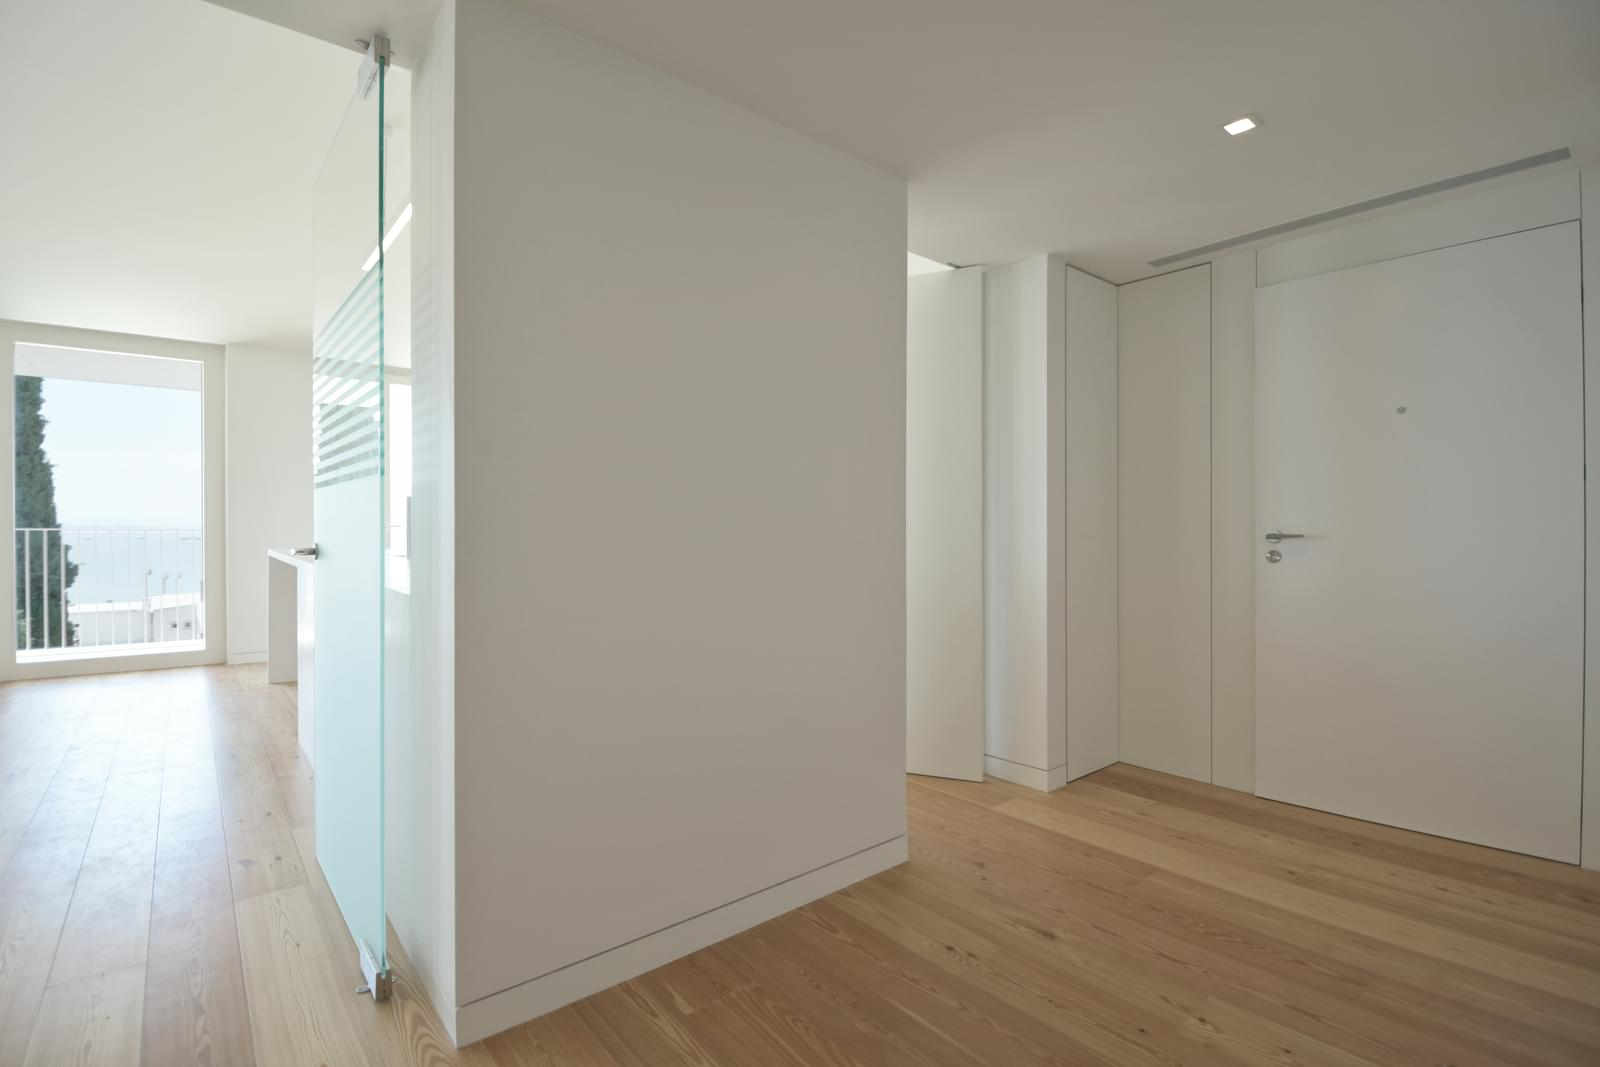 pf18051-apartamento-t4-lisboa-a815190a-4530-4ac0-a0f6-b93a234768b3